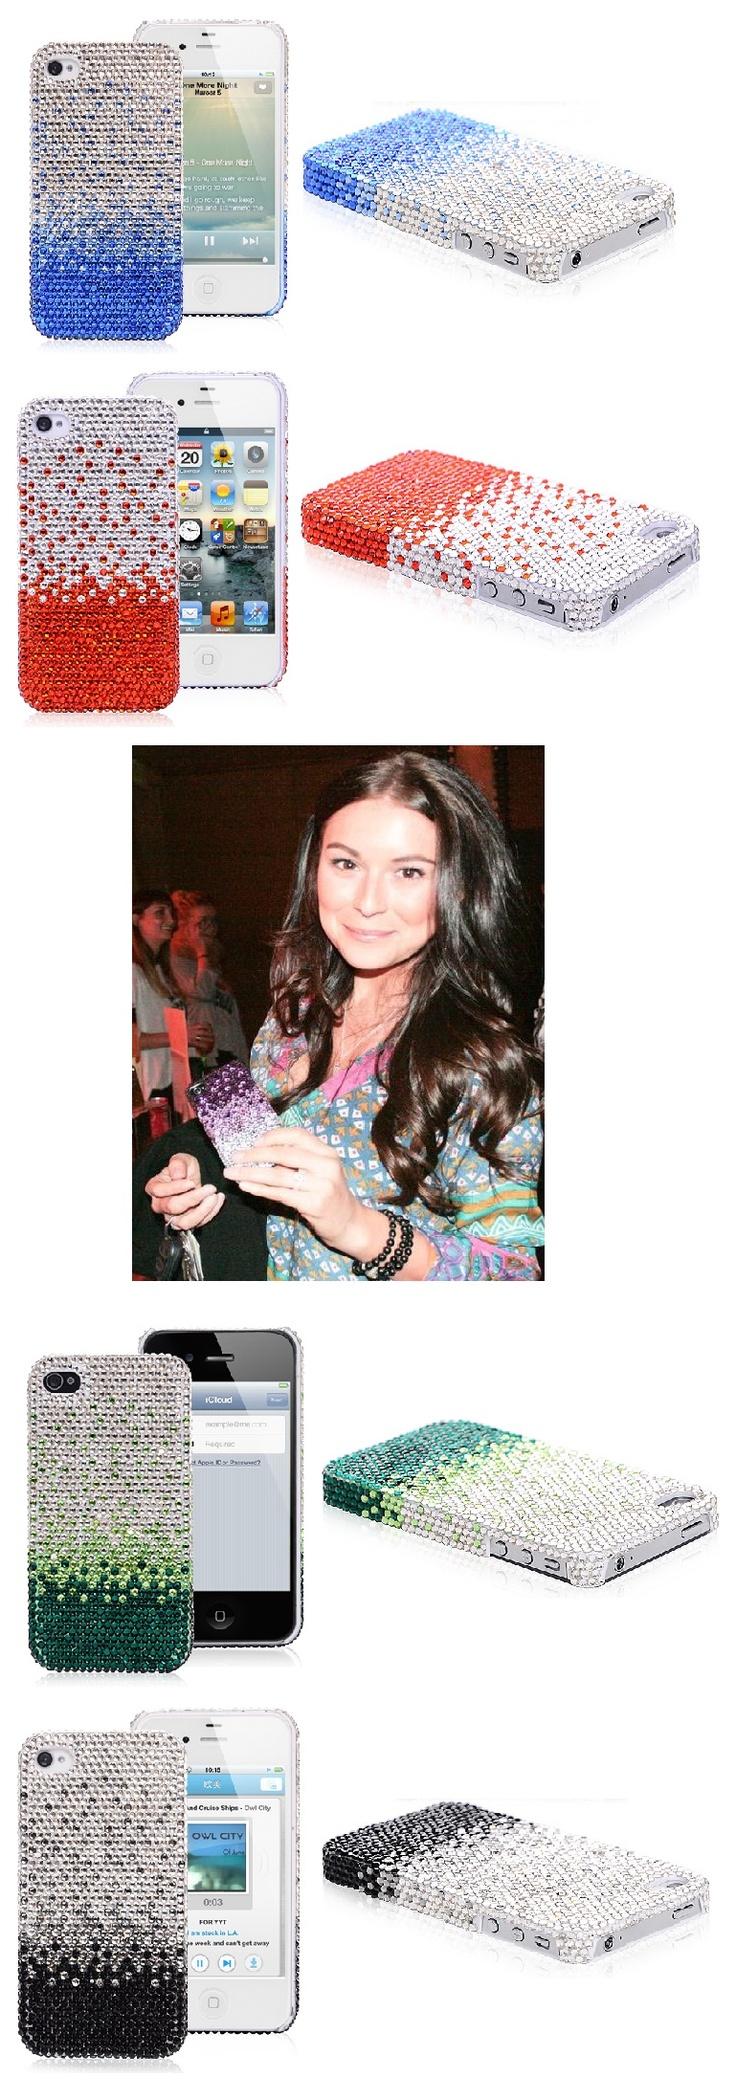 Alexa Vega has a Rhinestone iPhone 4 Glamour Case #alexavega #iphone4 #rhinestone #case #glamour #iphone #cover $14.35